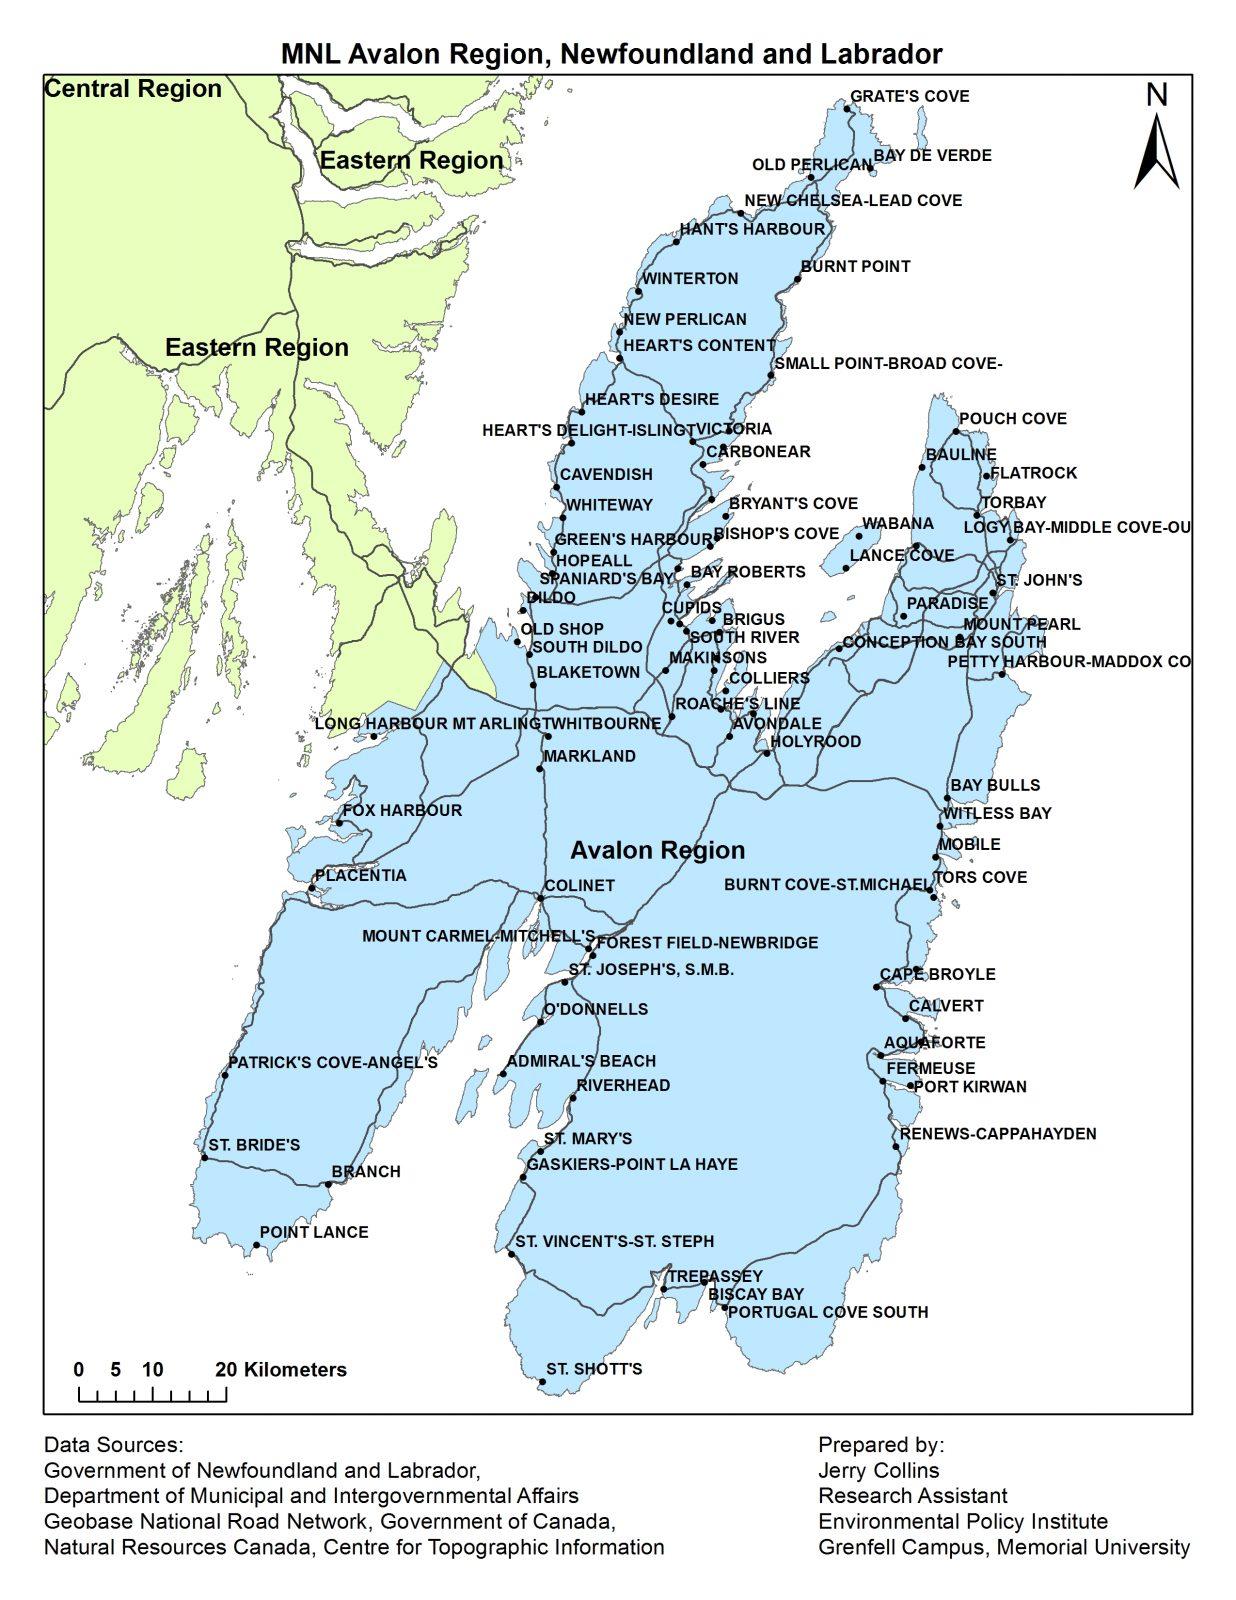 Munilities Newfoundland and Labrador Regional Maps - Exploring ... on canada map, laurentian mountains map, nova scotia map, alberta map, new brunswick map, yucatan peninsula map, quebec map, europe map, hispaniola map, hudson bay map, iceland map, manitoba map, bahamas map, avalon peninsula map, new mexico map, british columbia map, north america map, world map, labrador map, greenland map,